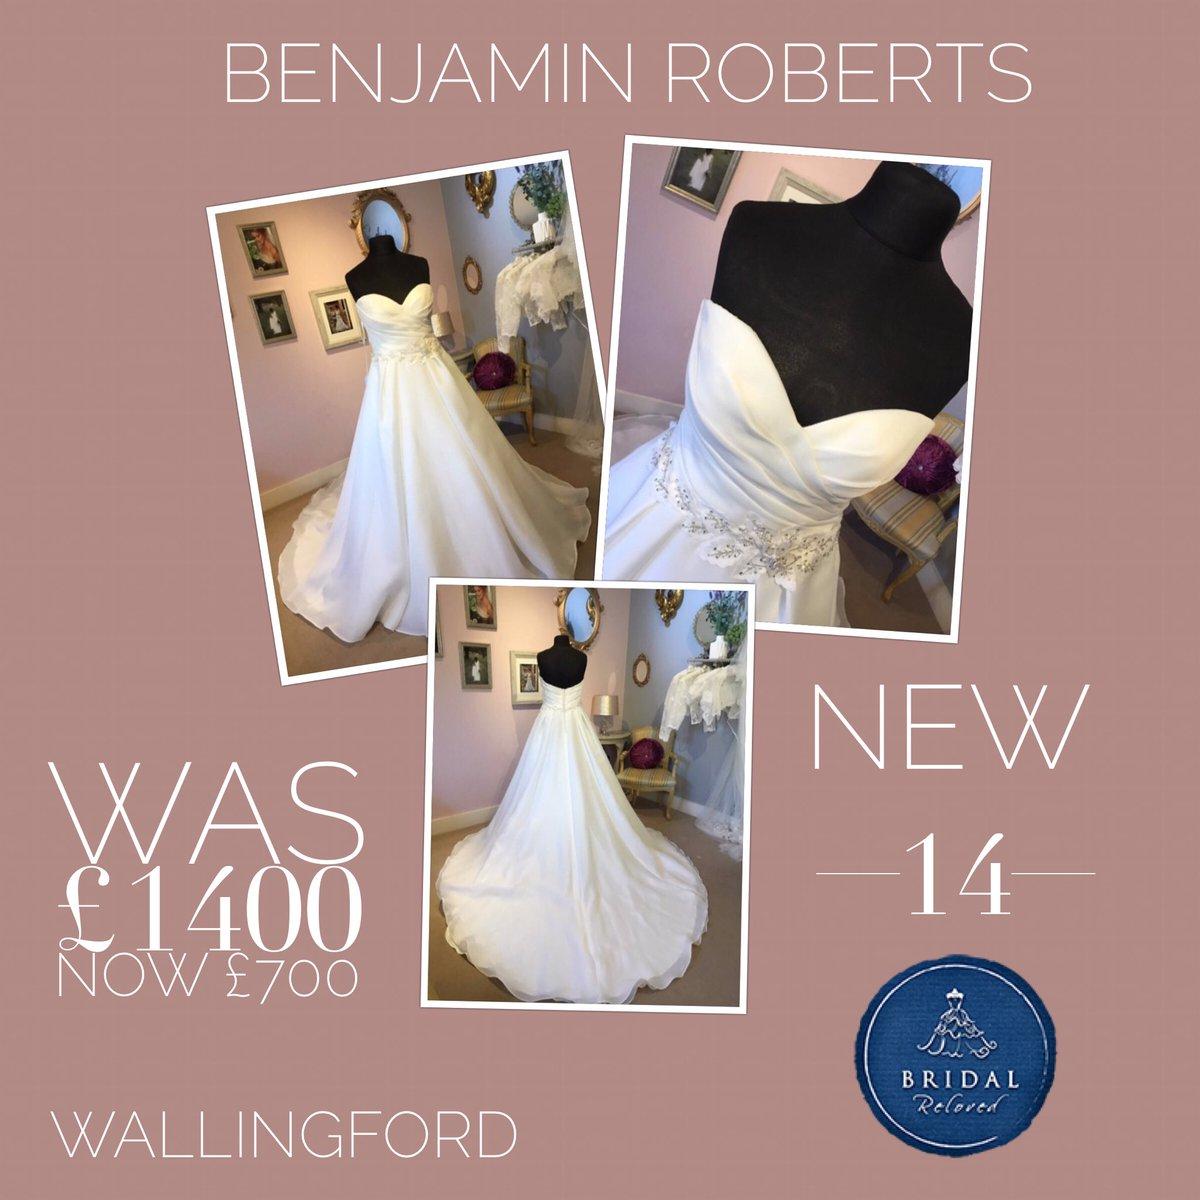 de7238ee8f518 ... #wedding #misstomrs 💍 #engaged #wallingford #weddingdress  #maggiesotterobridepic.twitter.com/sZkh3p4hvO